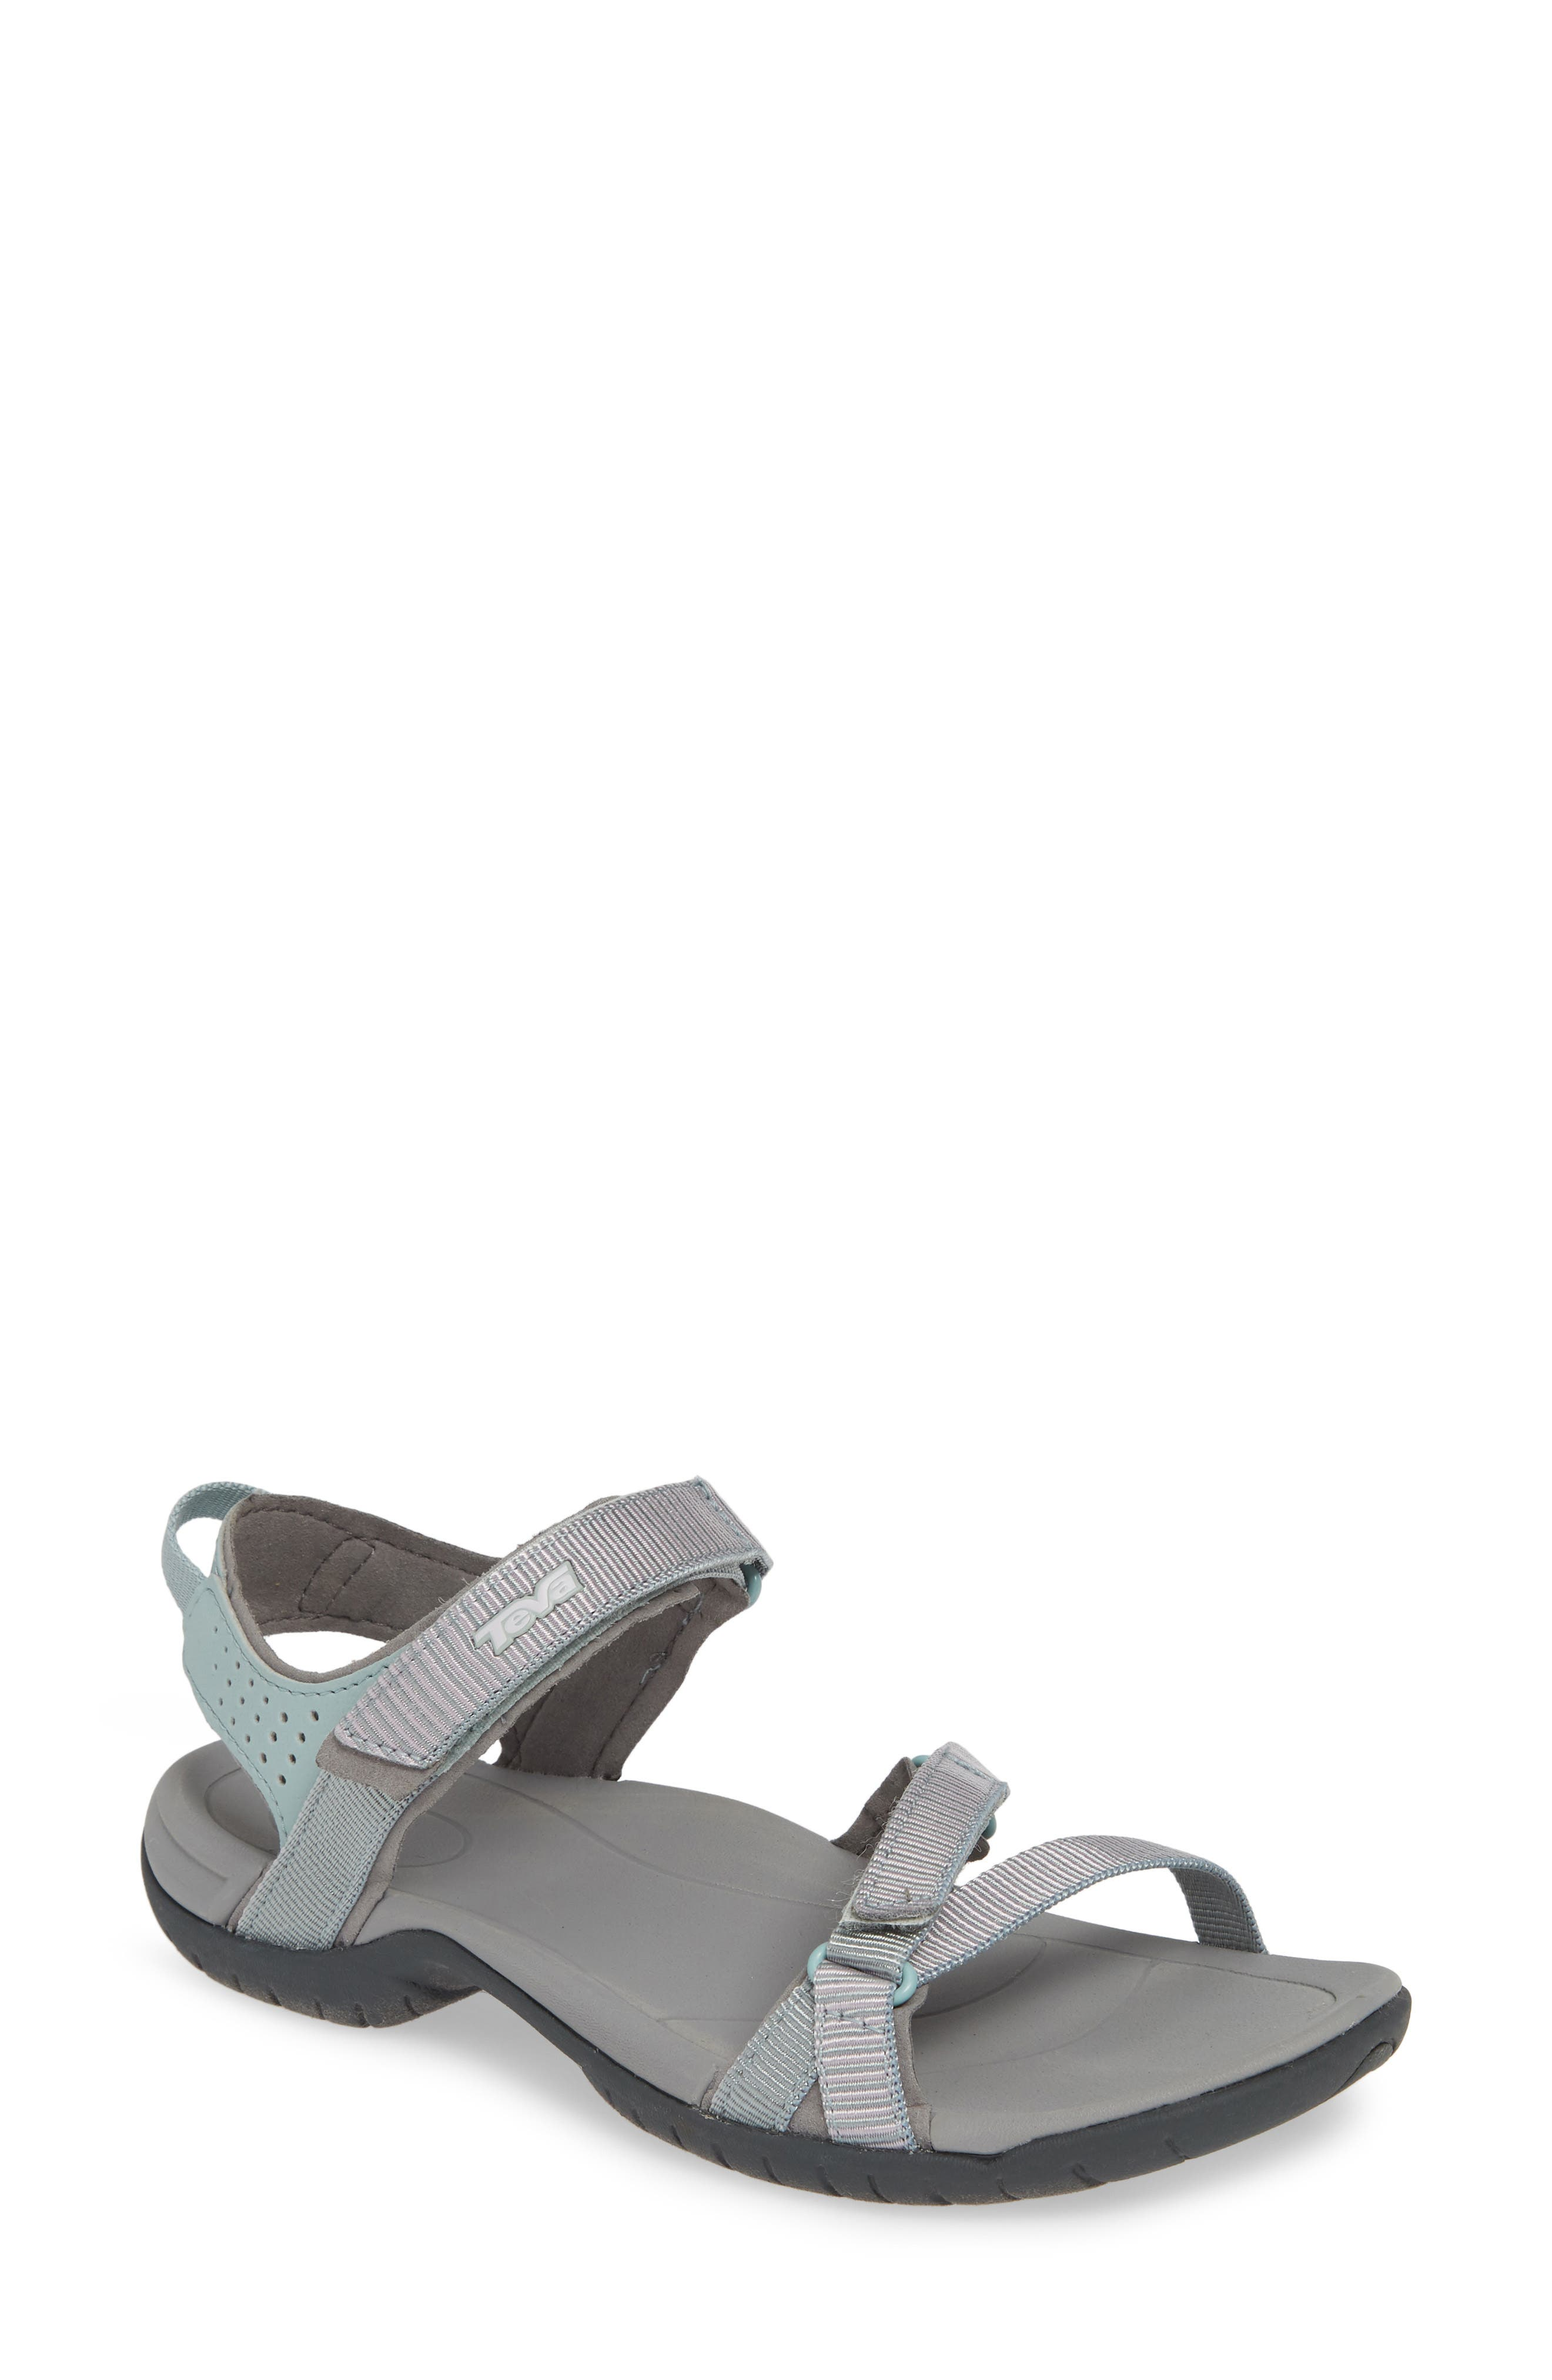 TEVA 'Verra' Sandal, Main, color, GRAY MIST FABRIC